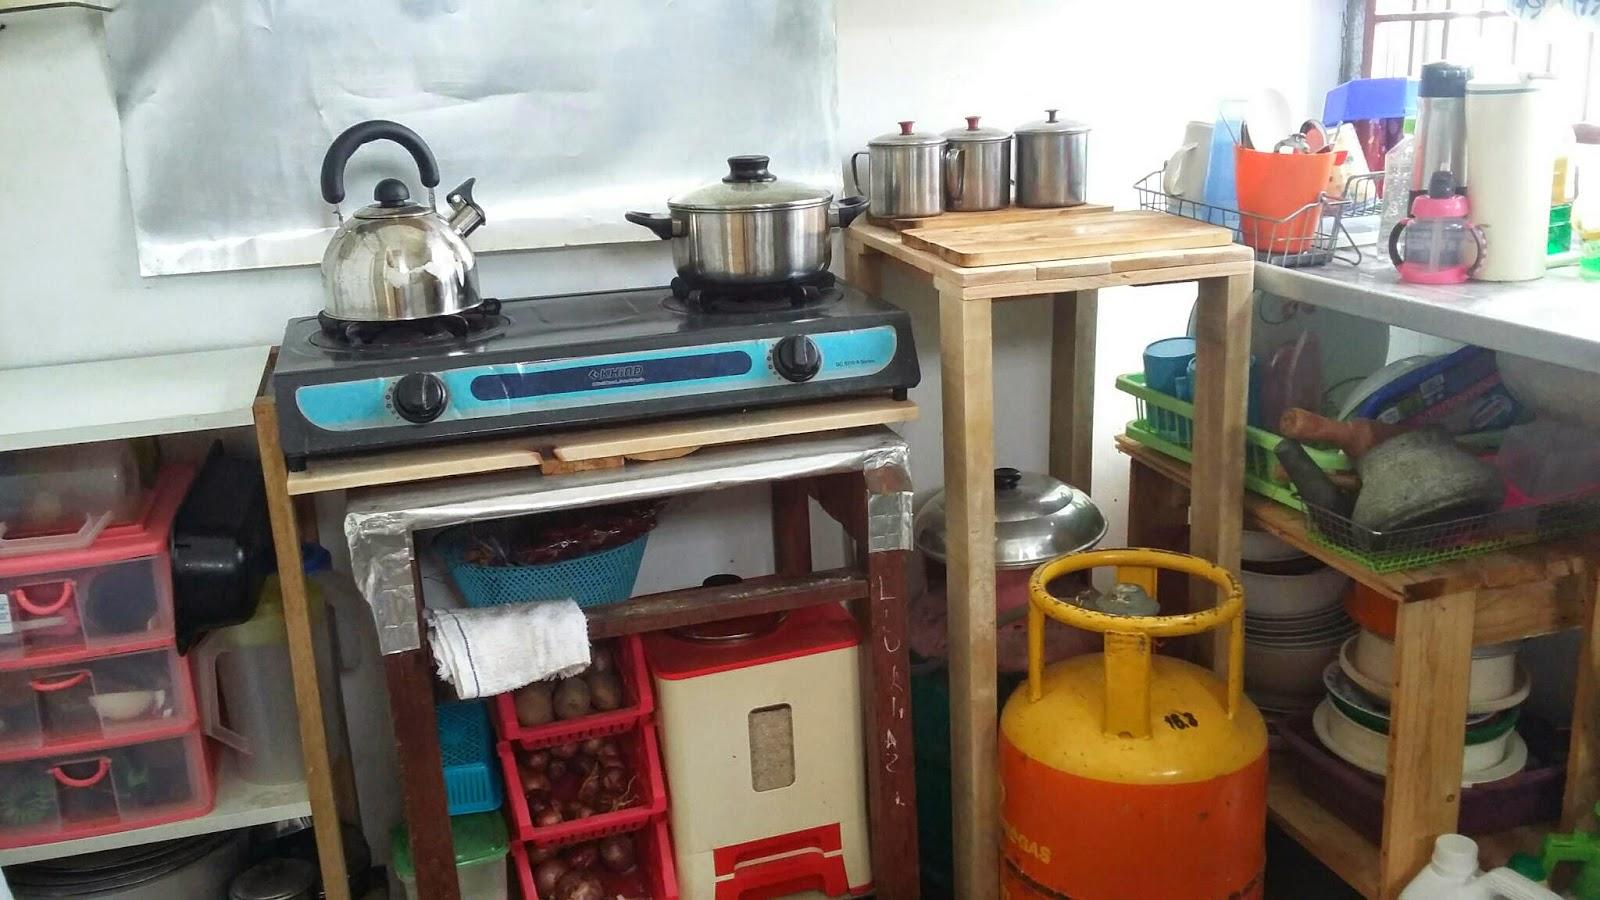 Bawah Troli Dimanfaatkan Buat Letak Perkakasan Kecil Dapur Segala Ba Dan Bekas Beras Ok Tu Barang Paling Mahal Kat Ni Penah